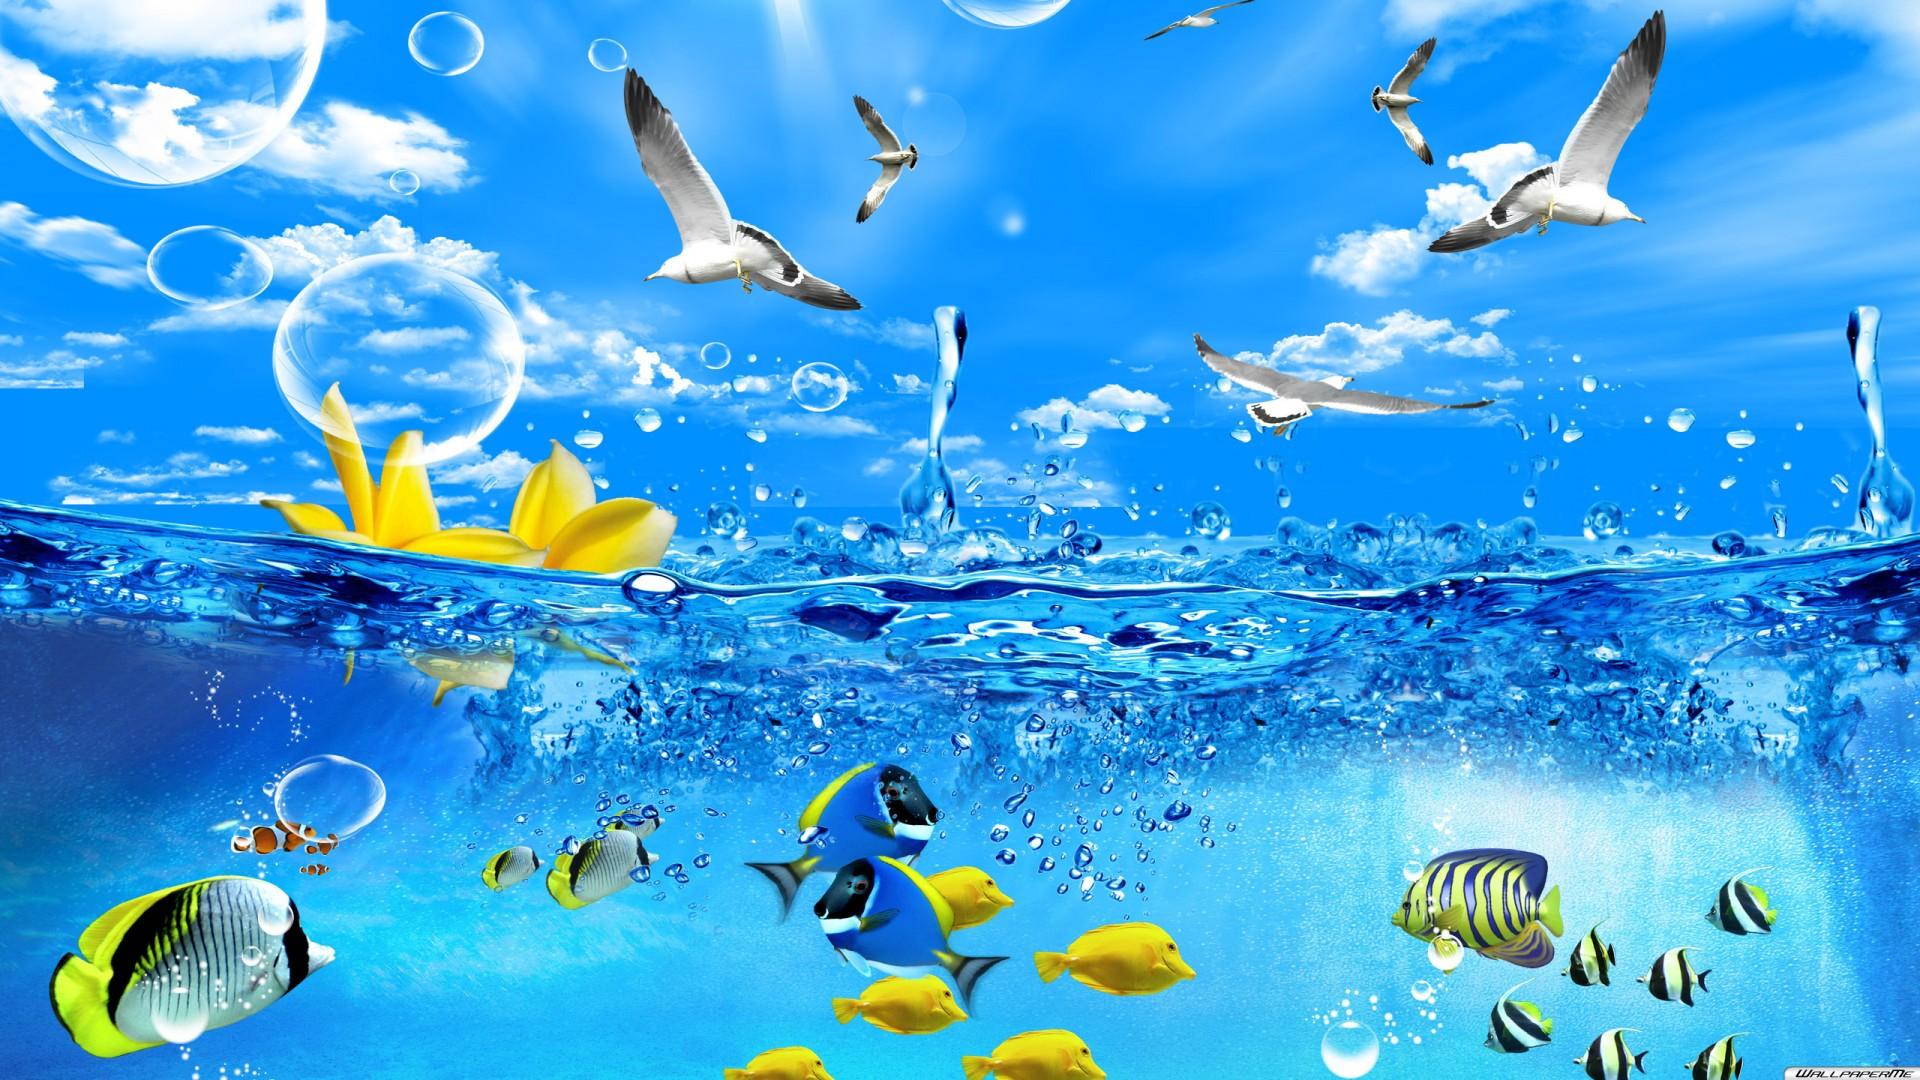 Desktop Hintergrundbilder   3D Fische Desktop 1920x1080 1920x1080